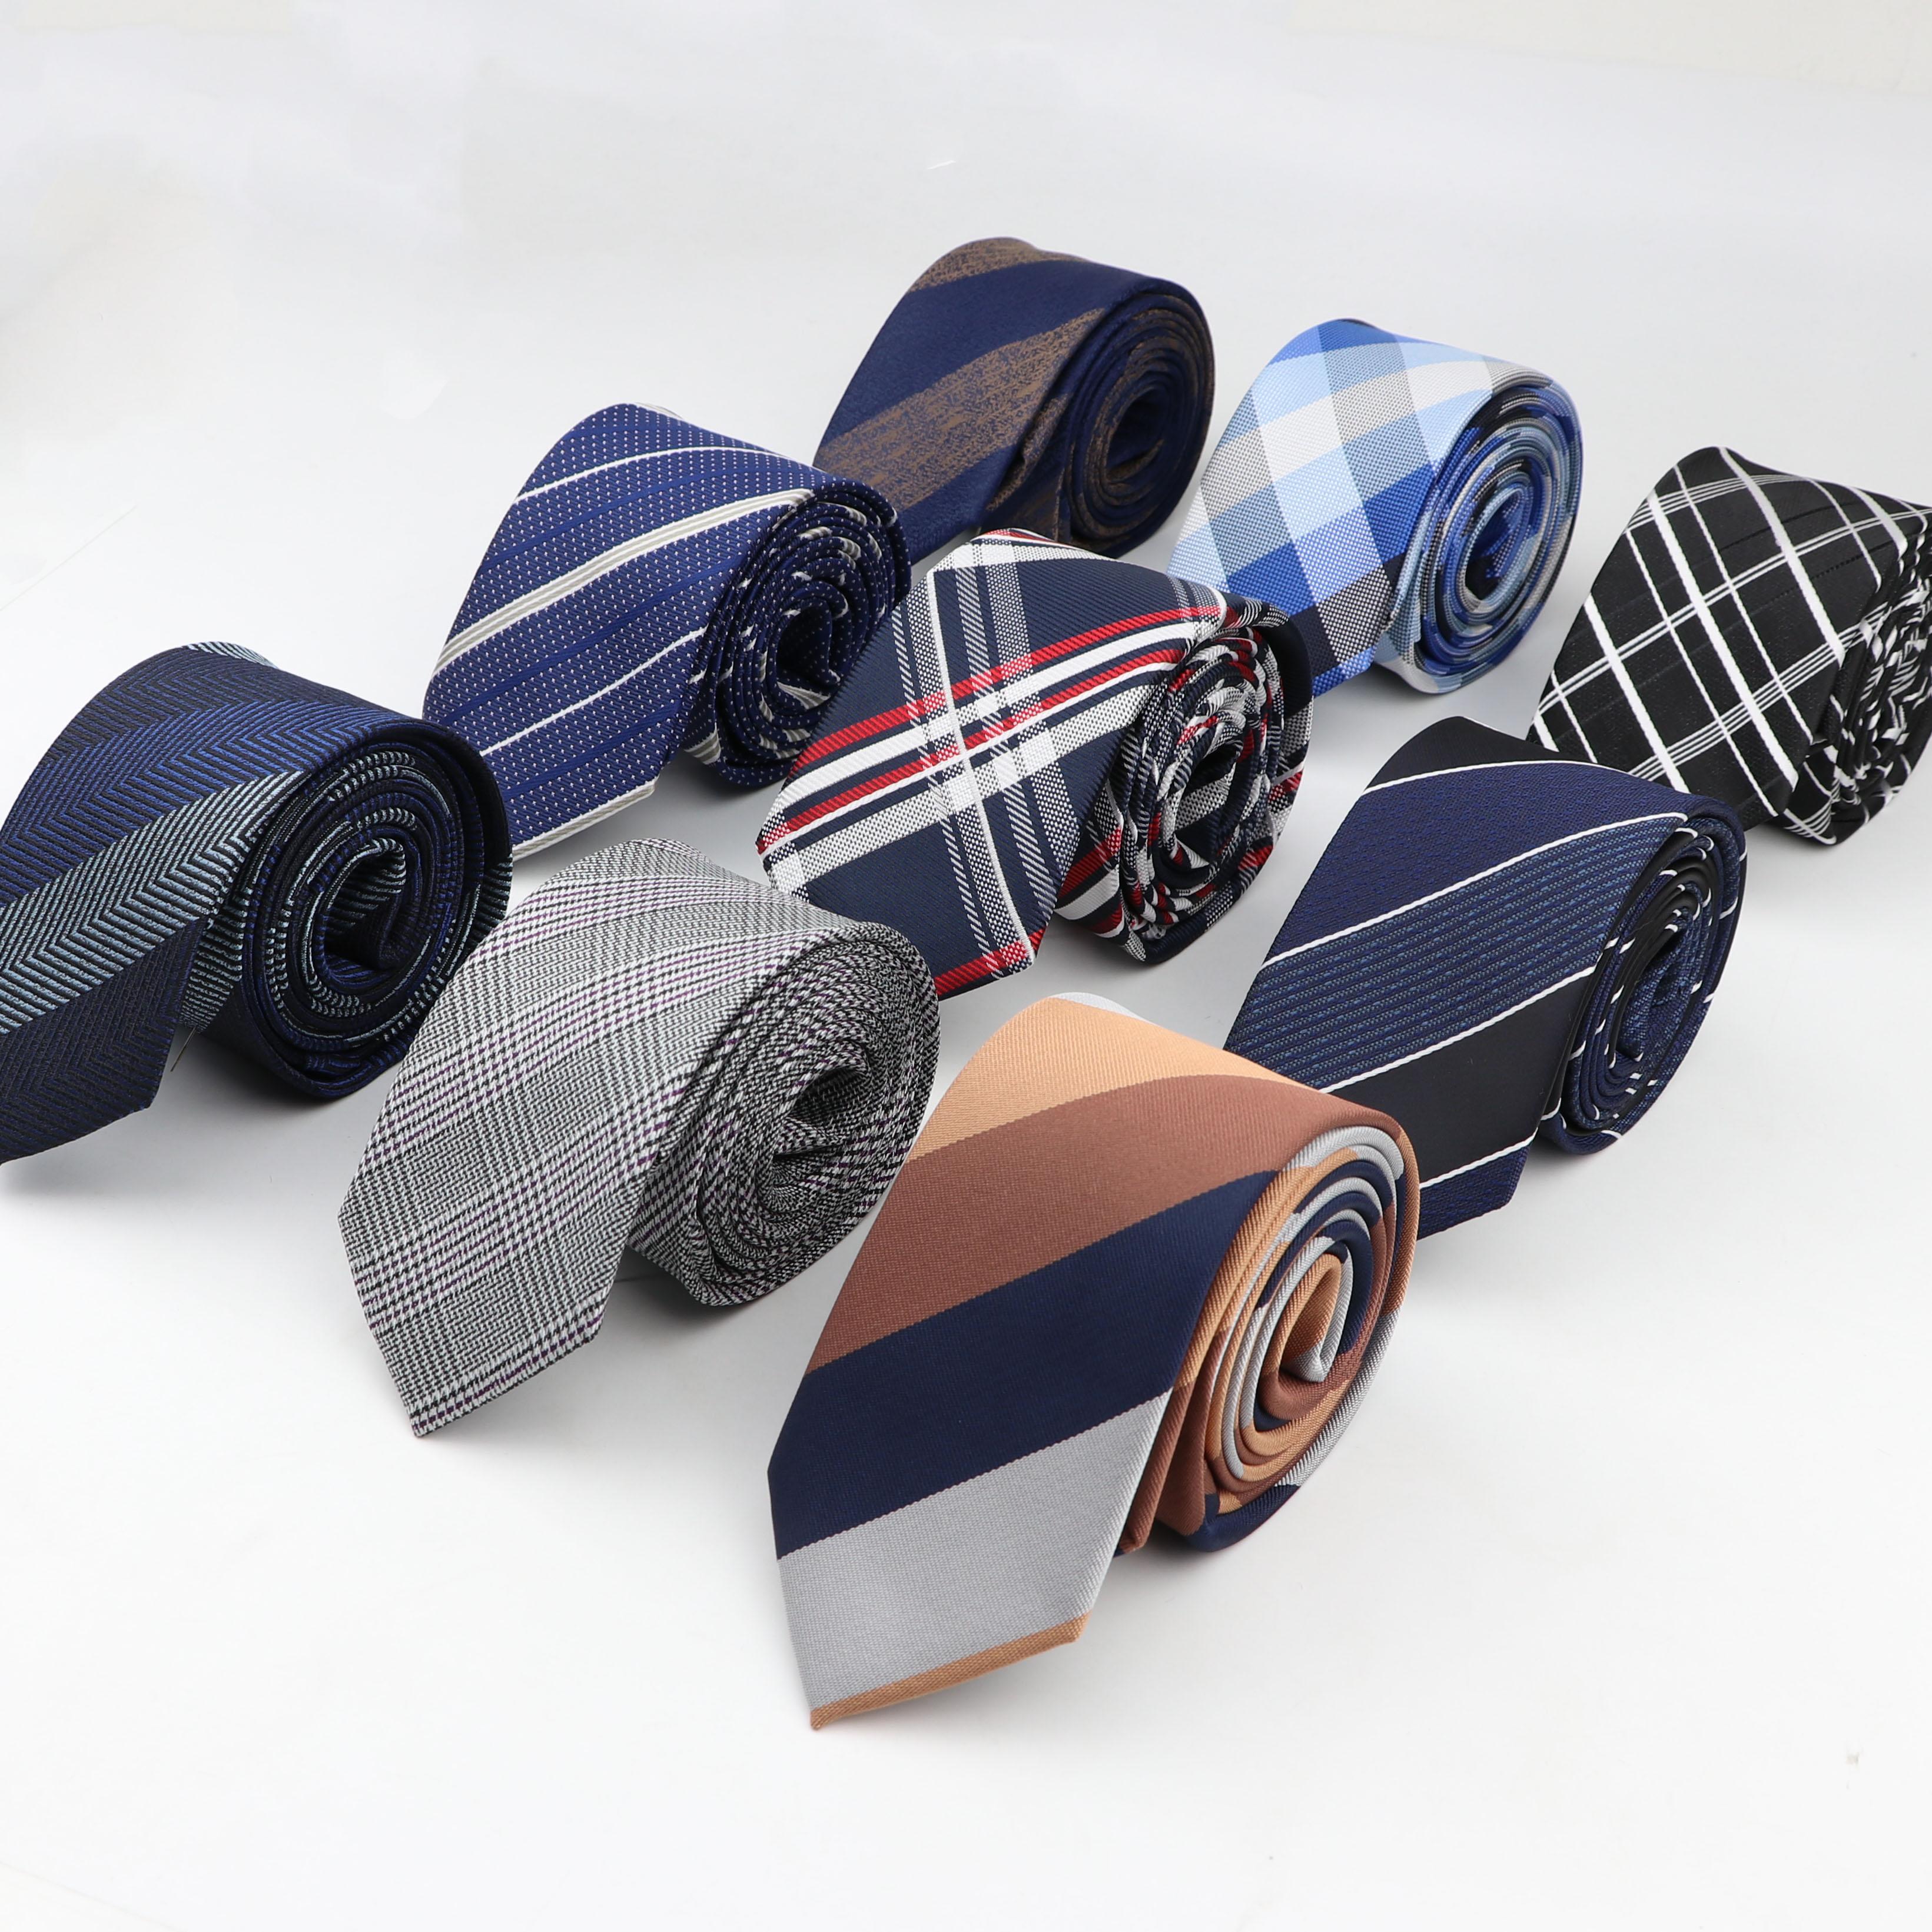 Men Business Tie 6-7cm Width Striped Plaid Designer Jacquard Wedding Necktie Narrow Classic Ties 1200 Needles Polyester Neckwear